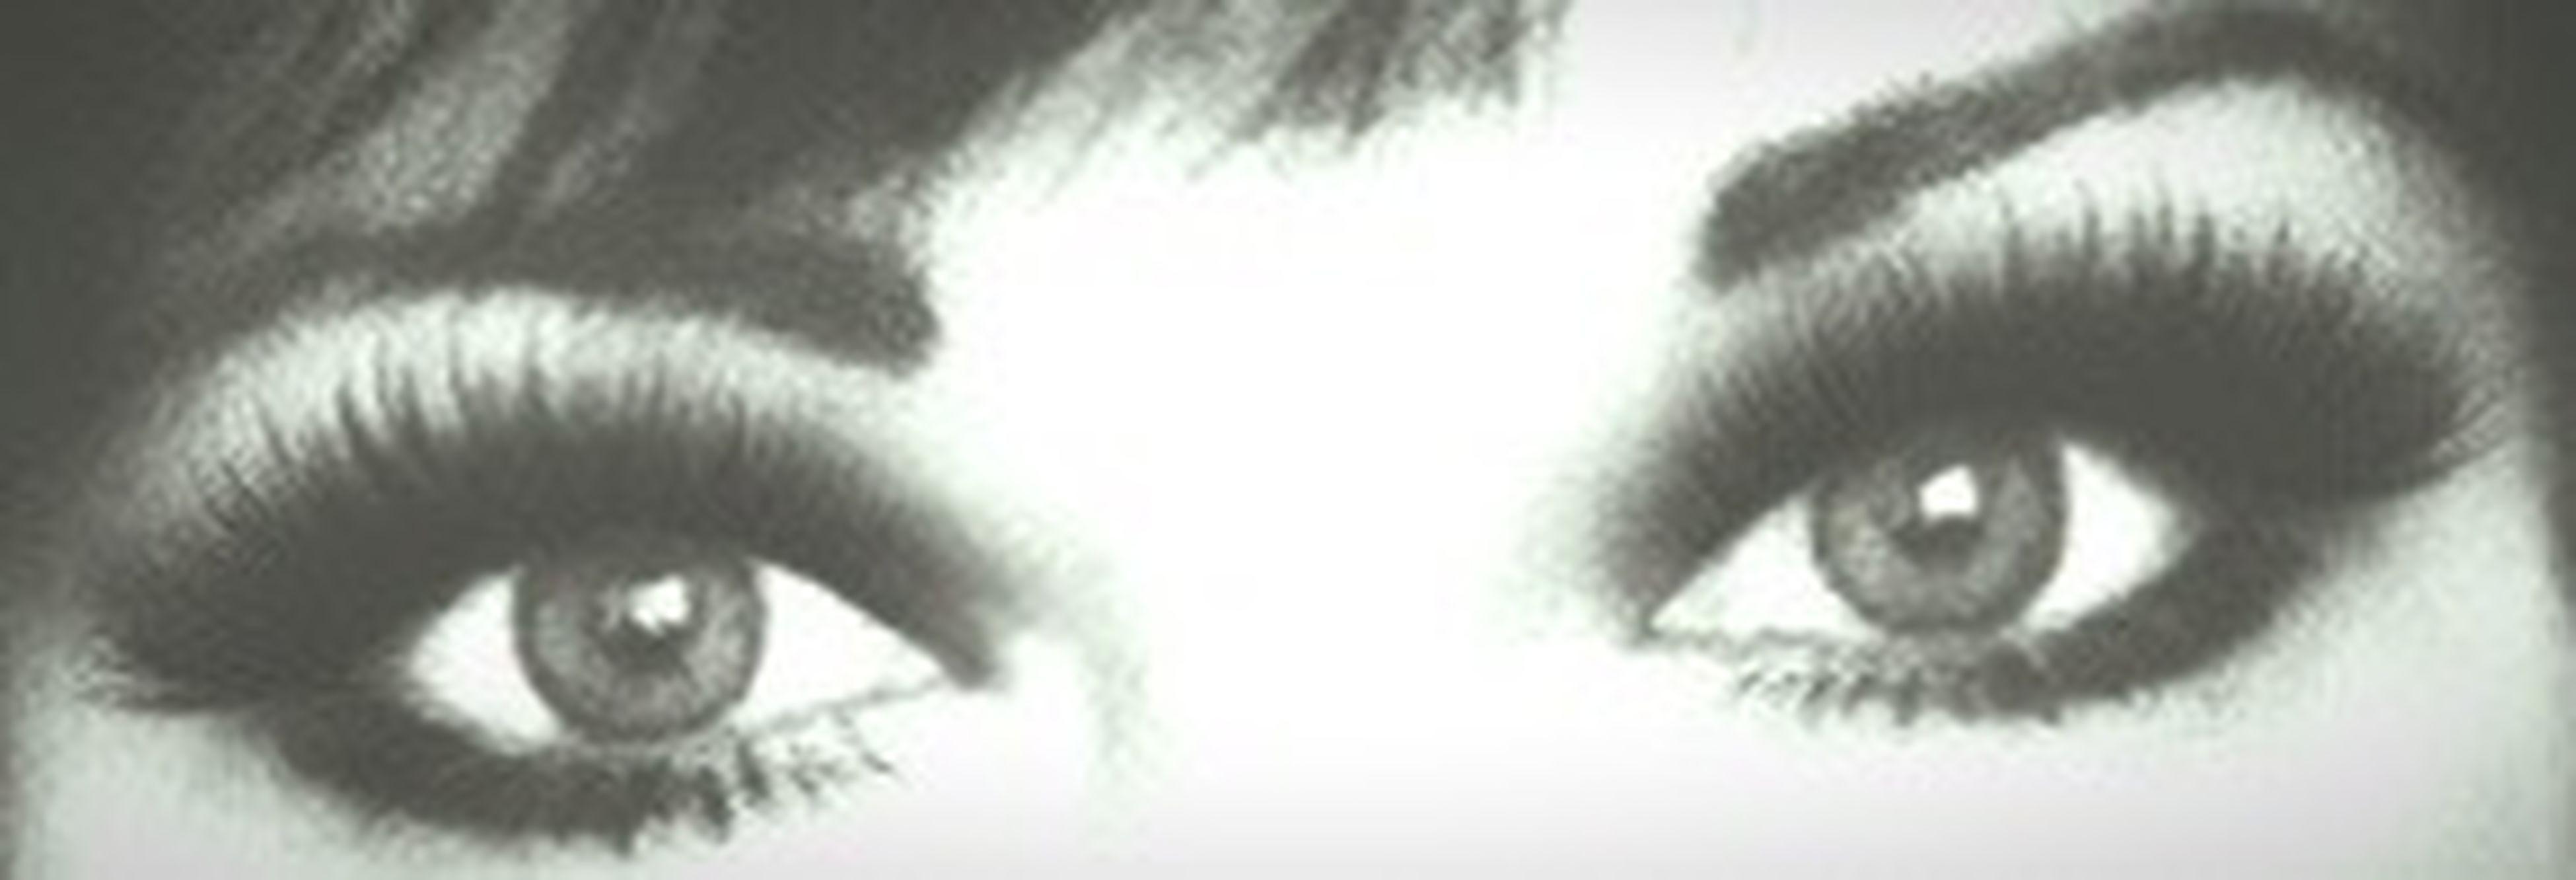 close-up, looking at camera, human eye, portrait, headshot, human face, part of, eyesight, indoors, eyelash, lifestyles, sensory perception, young adult, front view, staring, extreme close up, selective focus